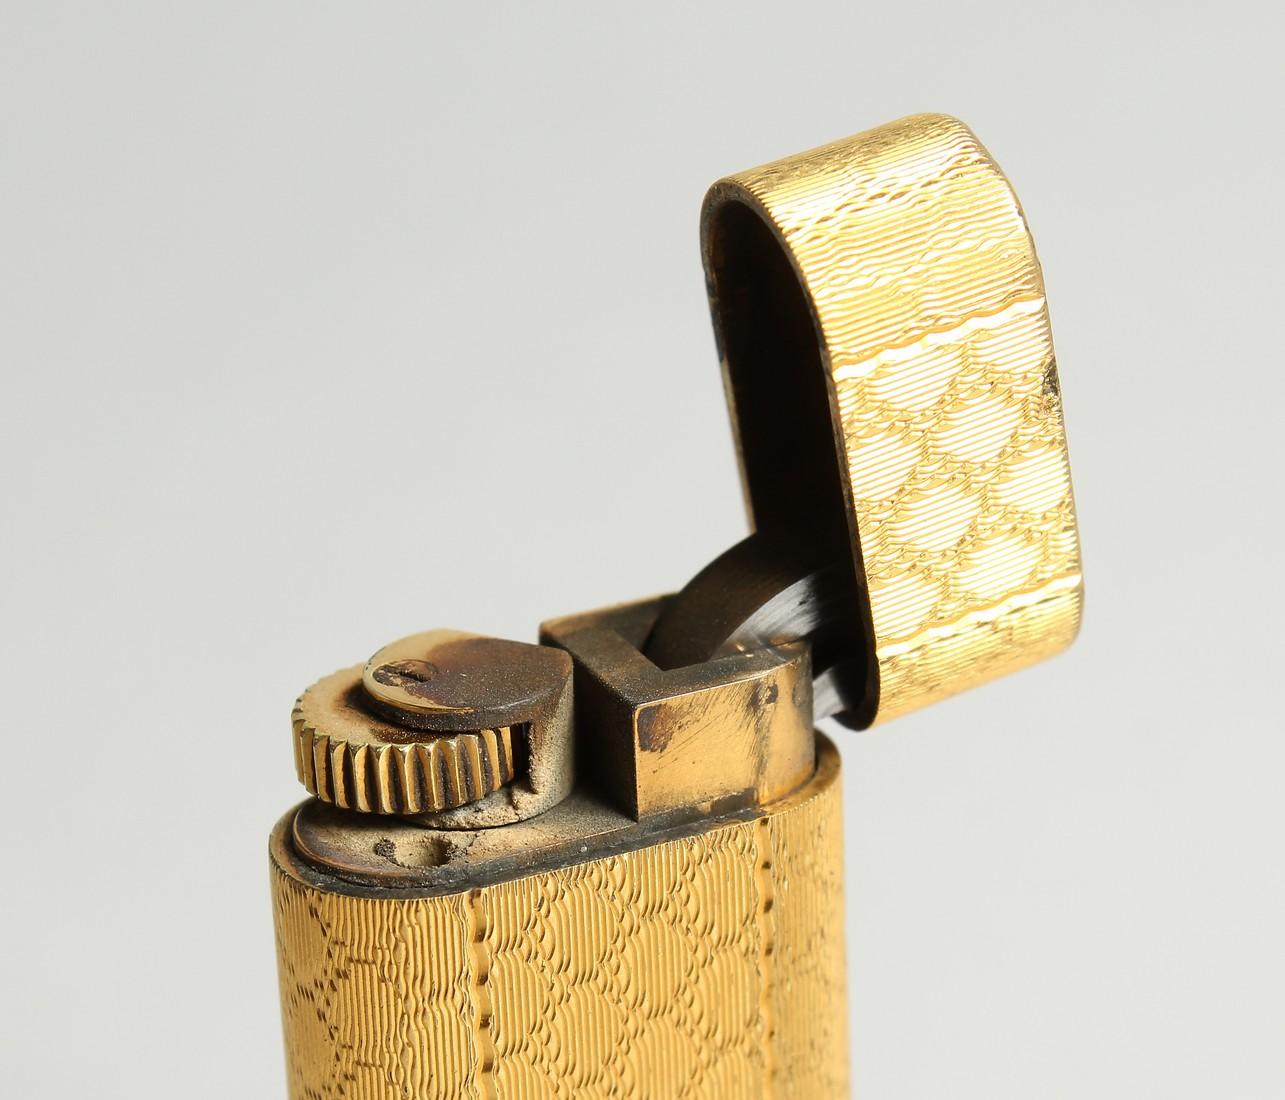 A GOOD CARTIER LIGHTER in original box. - Image 7 of 9